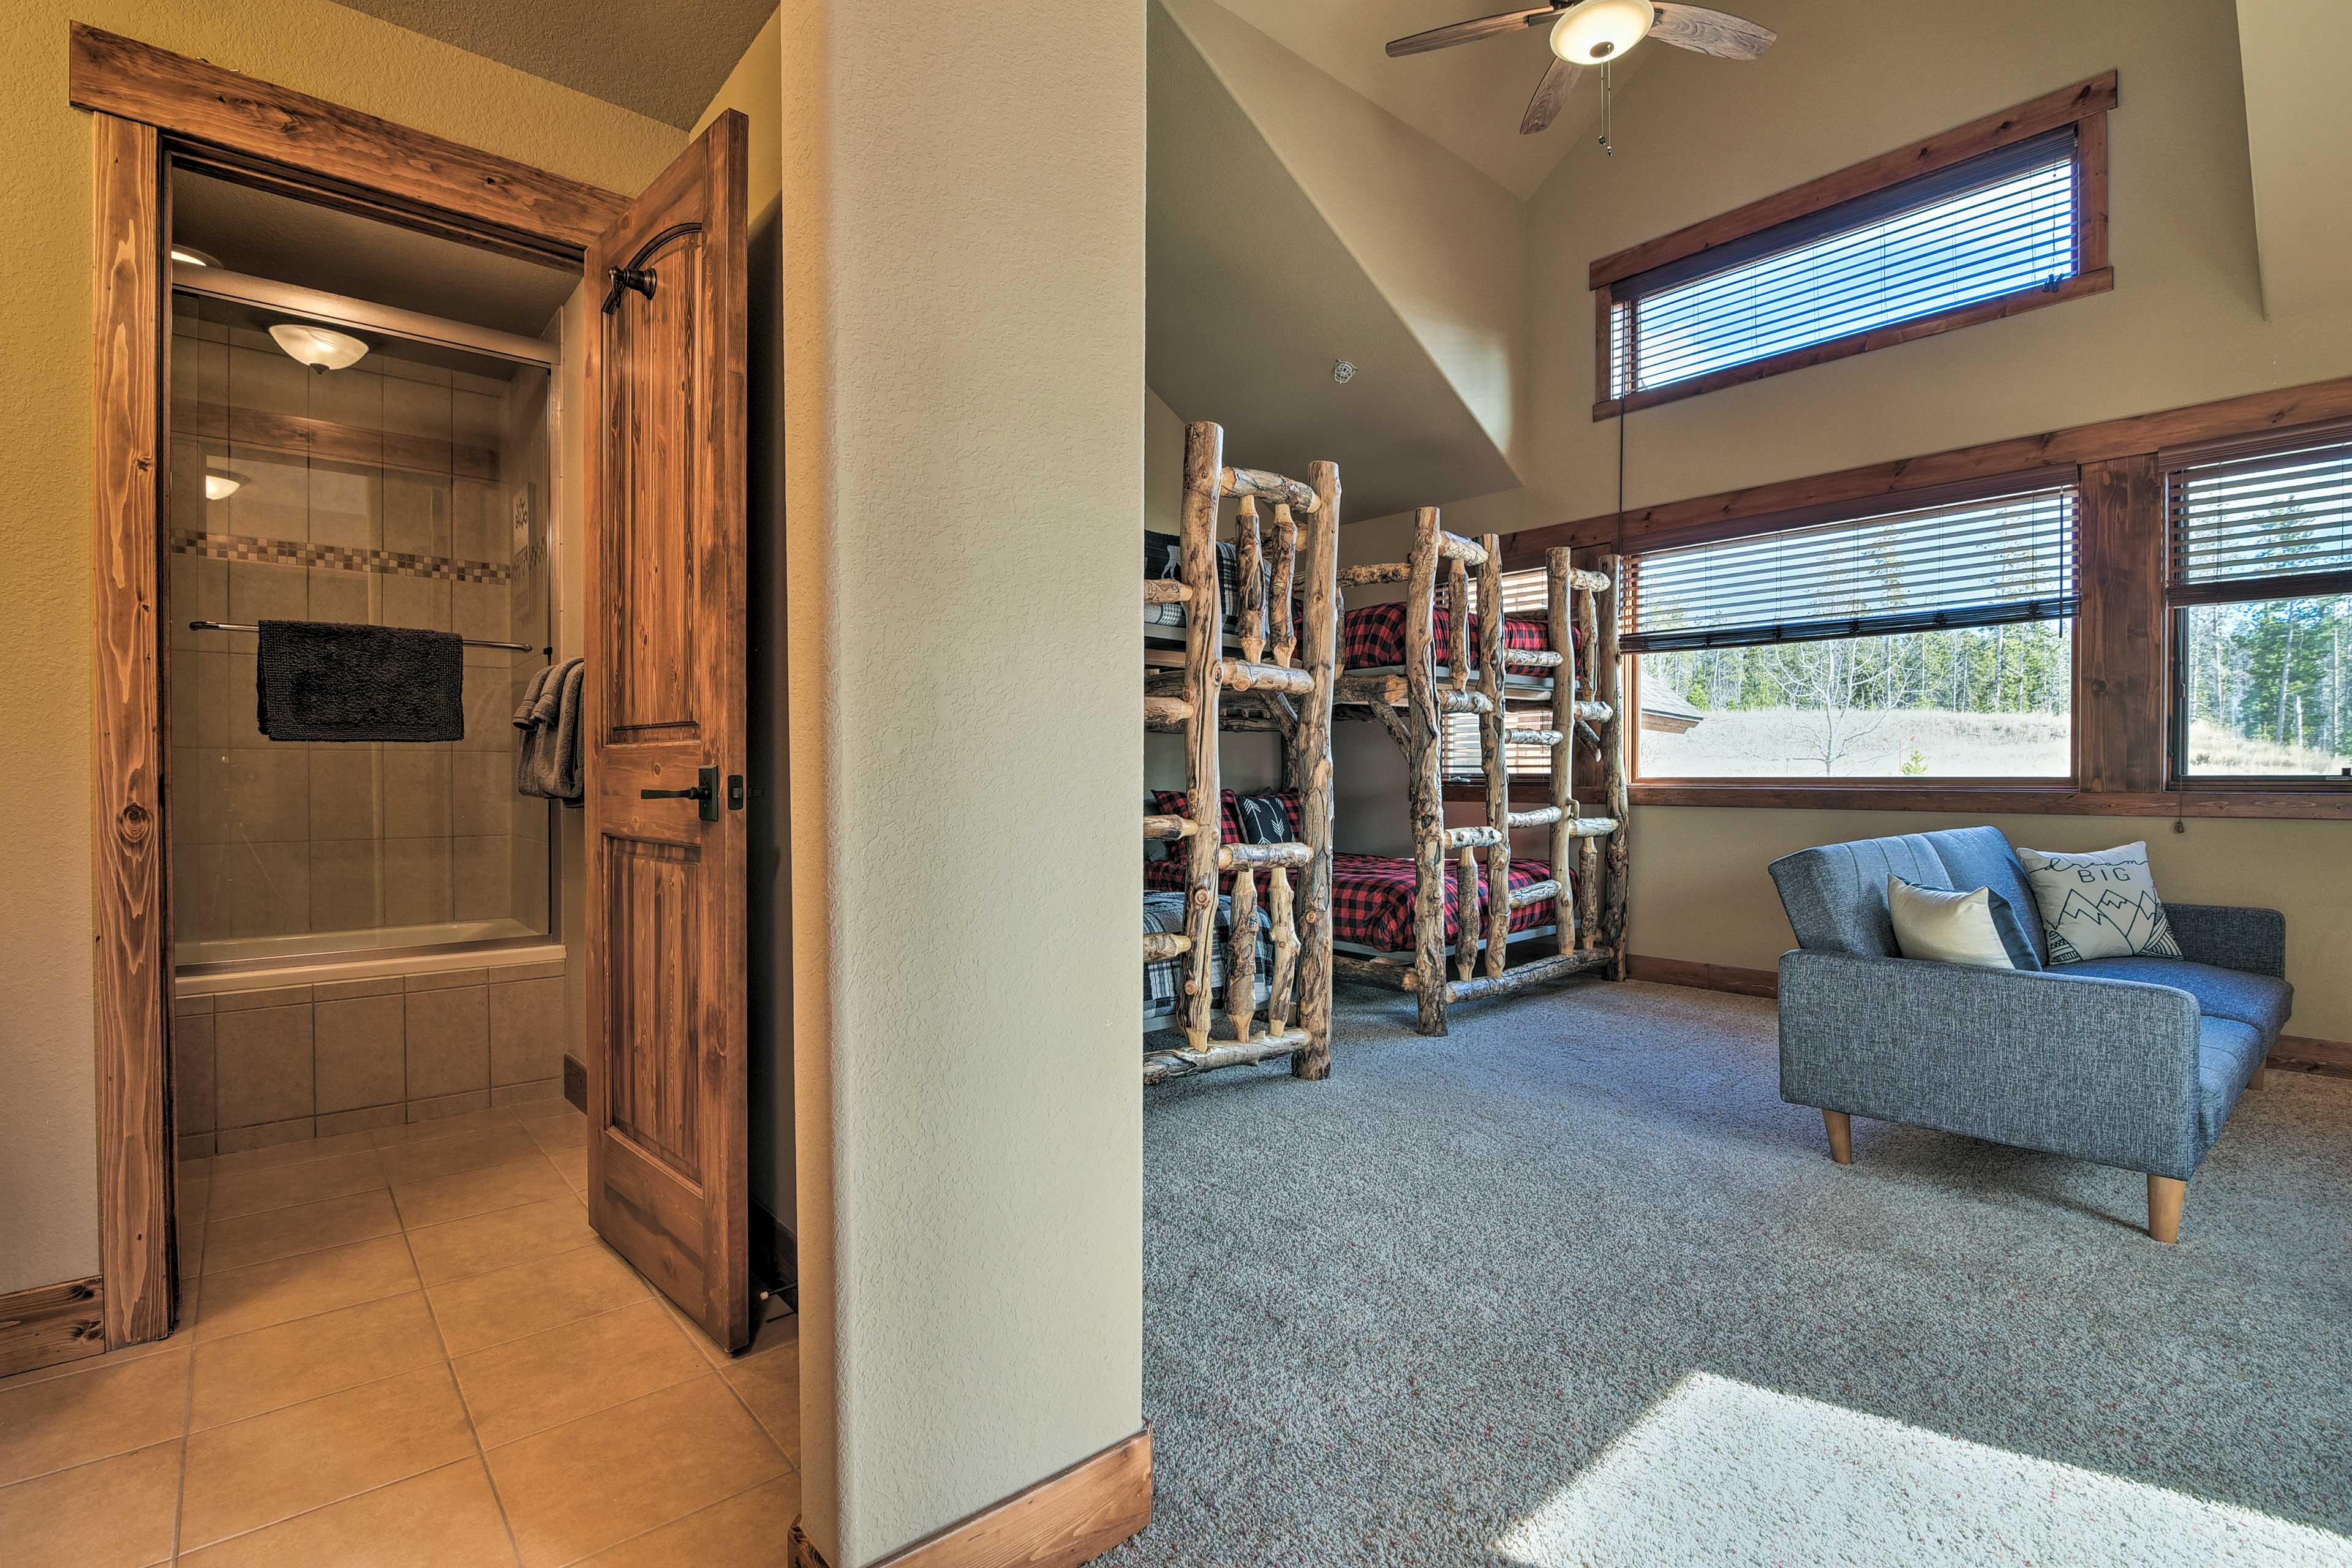 Enjoy the perks of an adjacent en-suite bathroom.